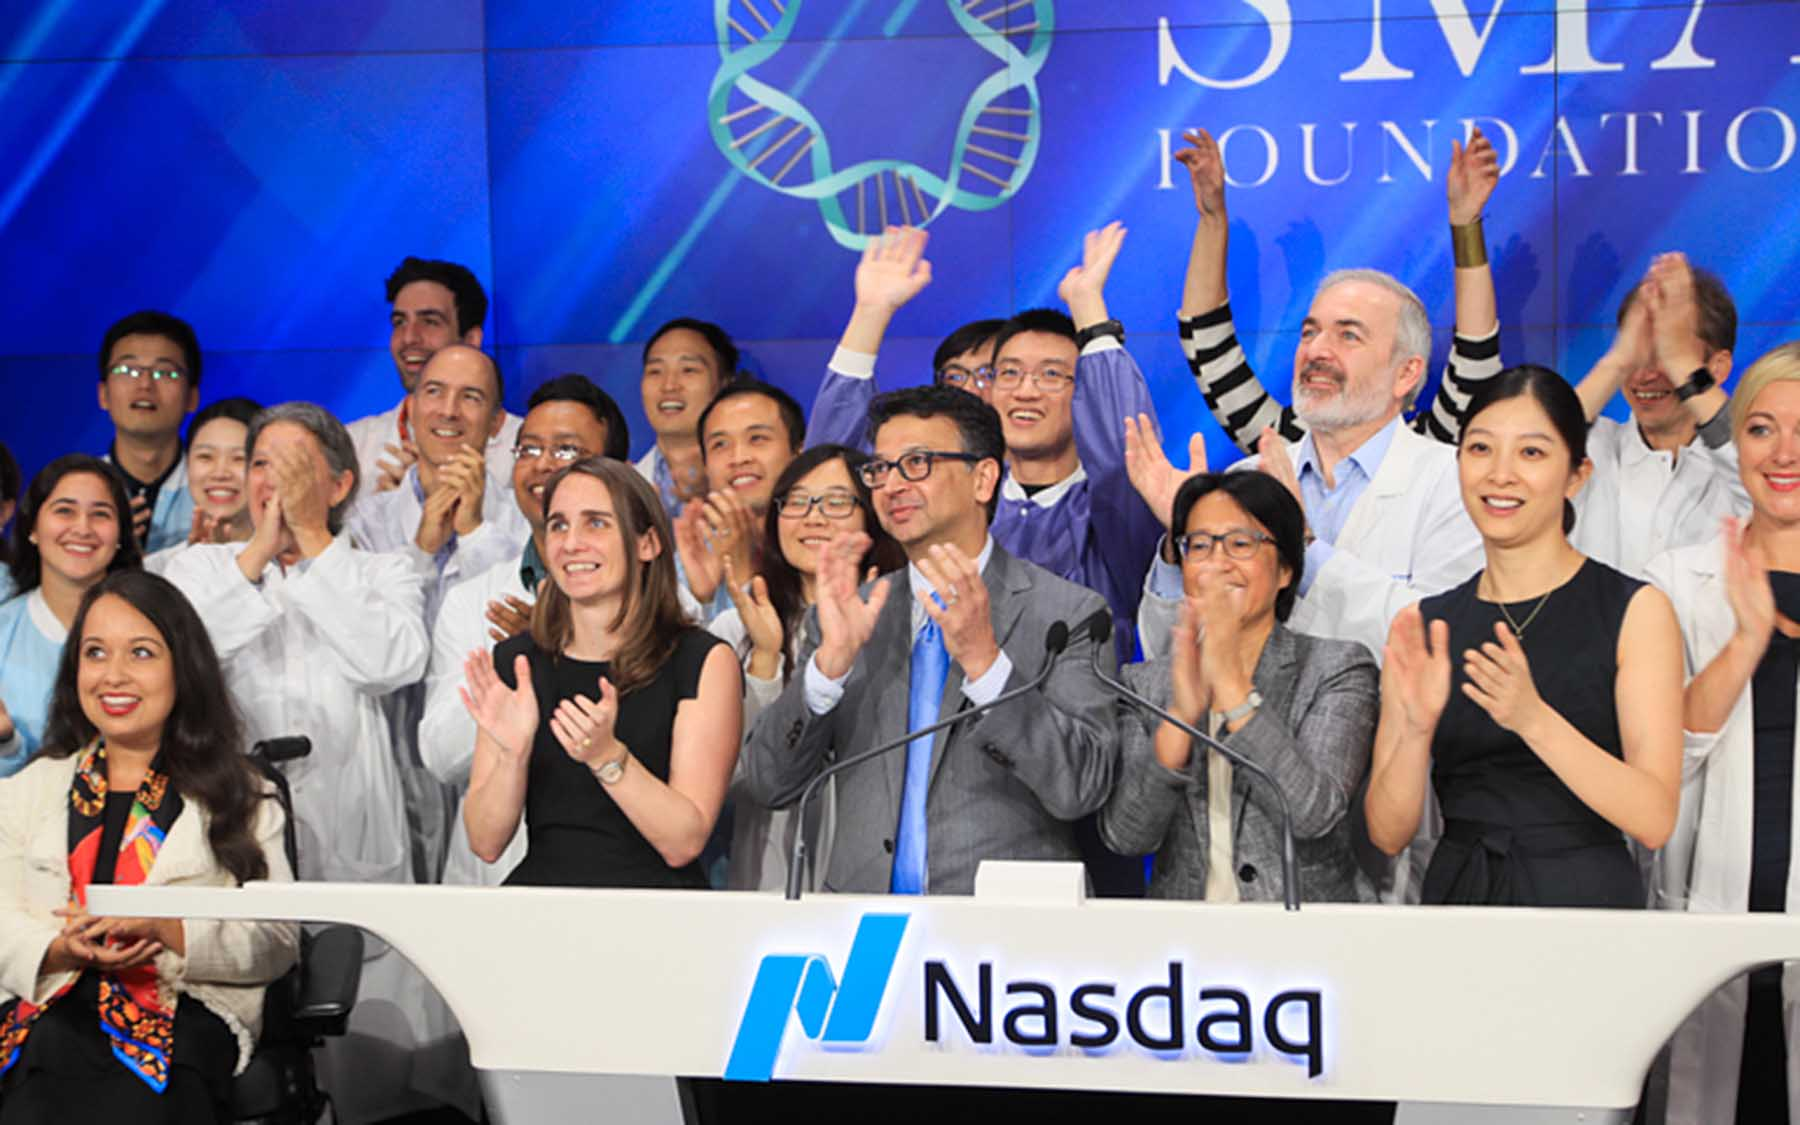 Adrian Krainer and lab at Nasdaq